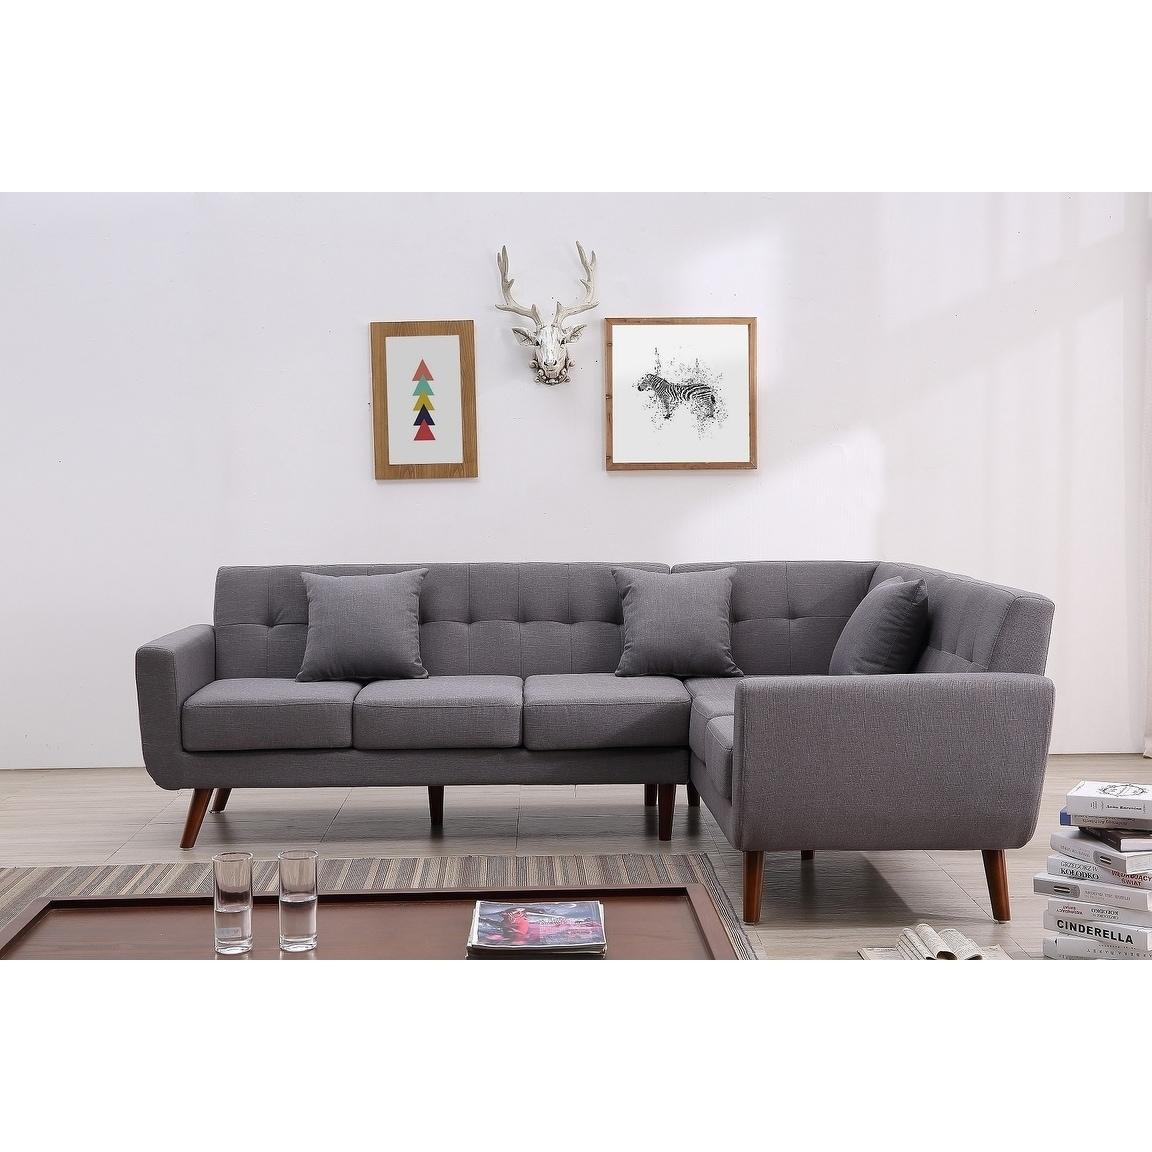 US Pride Furniture Linen Tufted Nailhead Trim Chesterfield Love Seat, Dark Grey, S5280-L